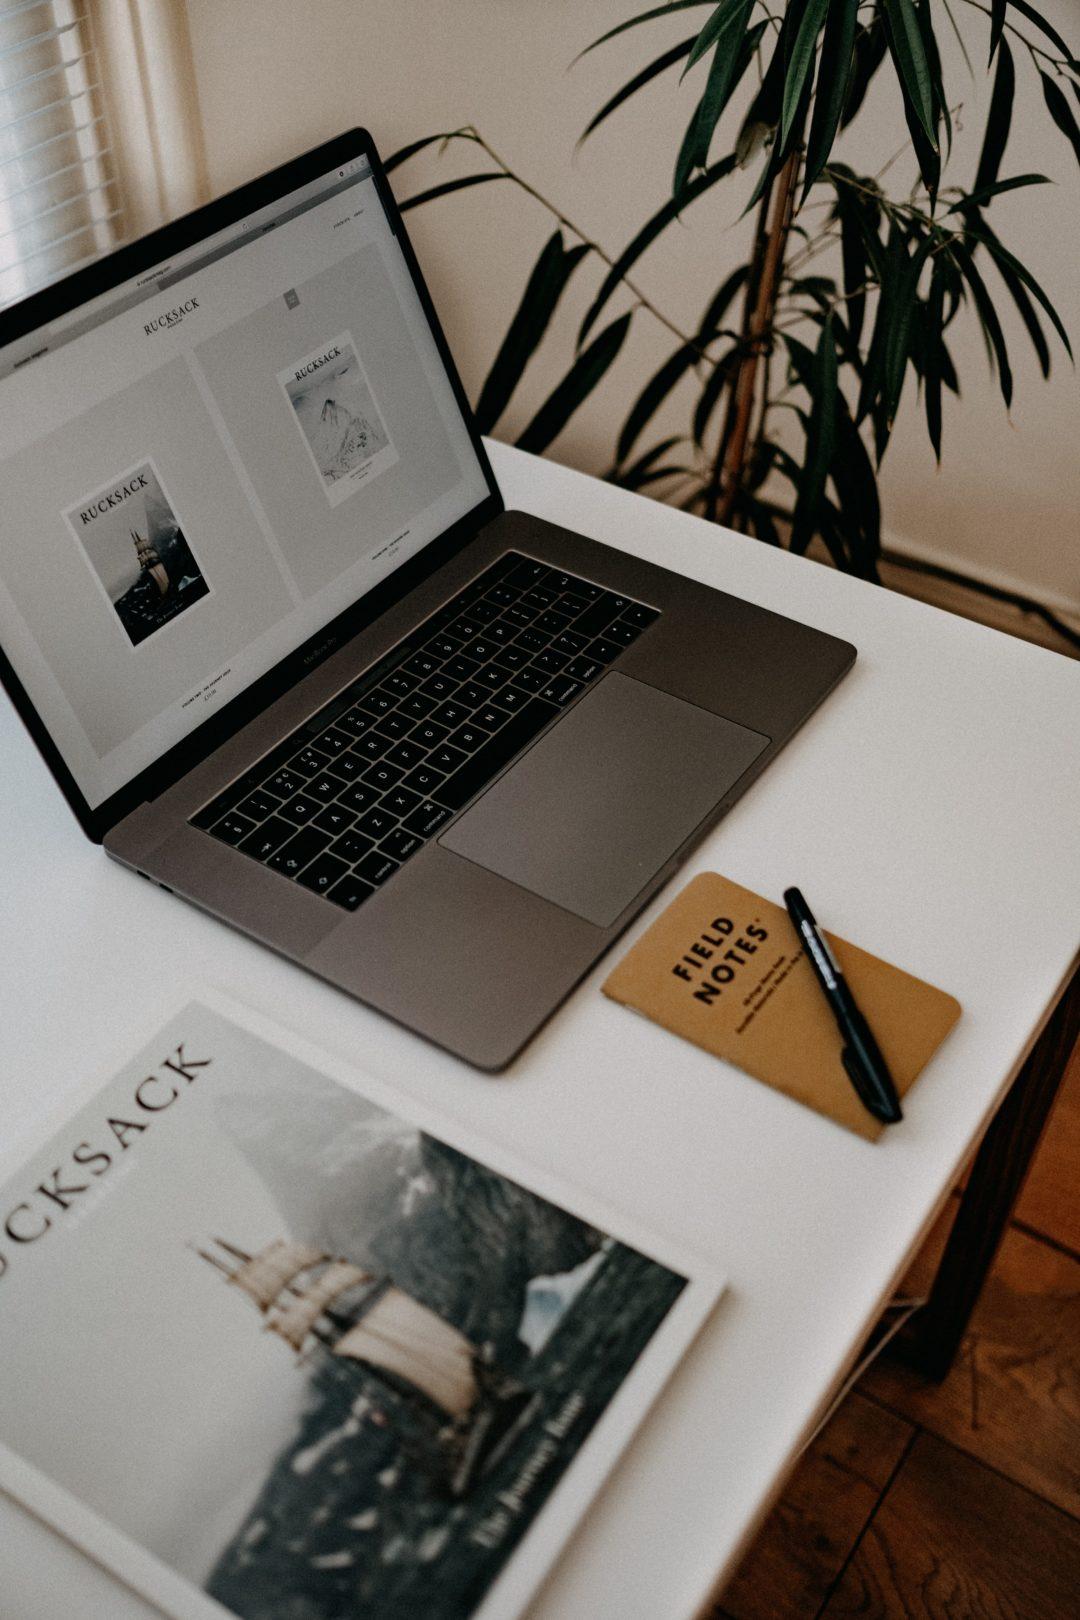 Creation de site vitrine - Constance Leplomb Freelance | Agence Web